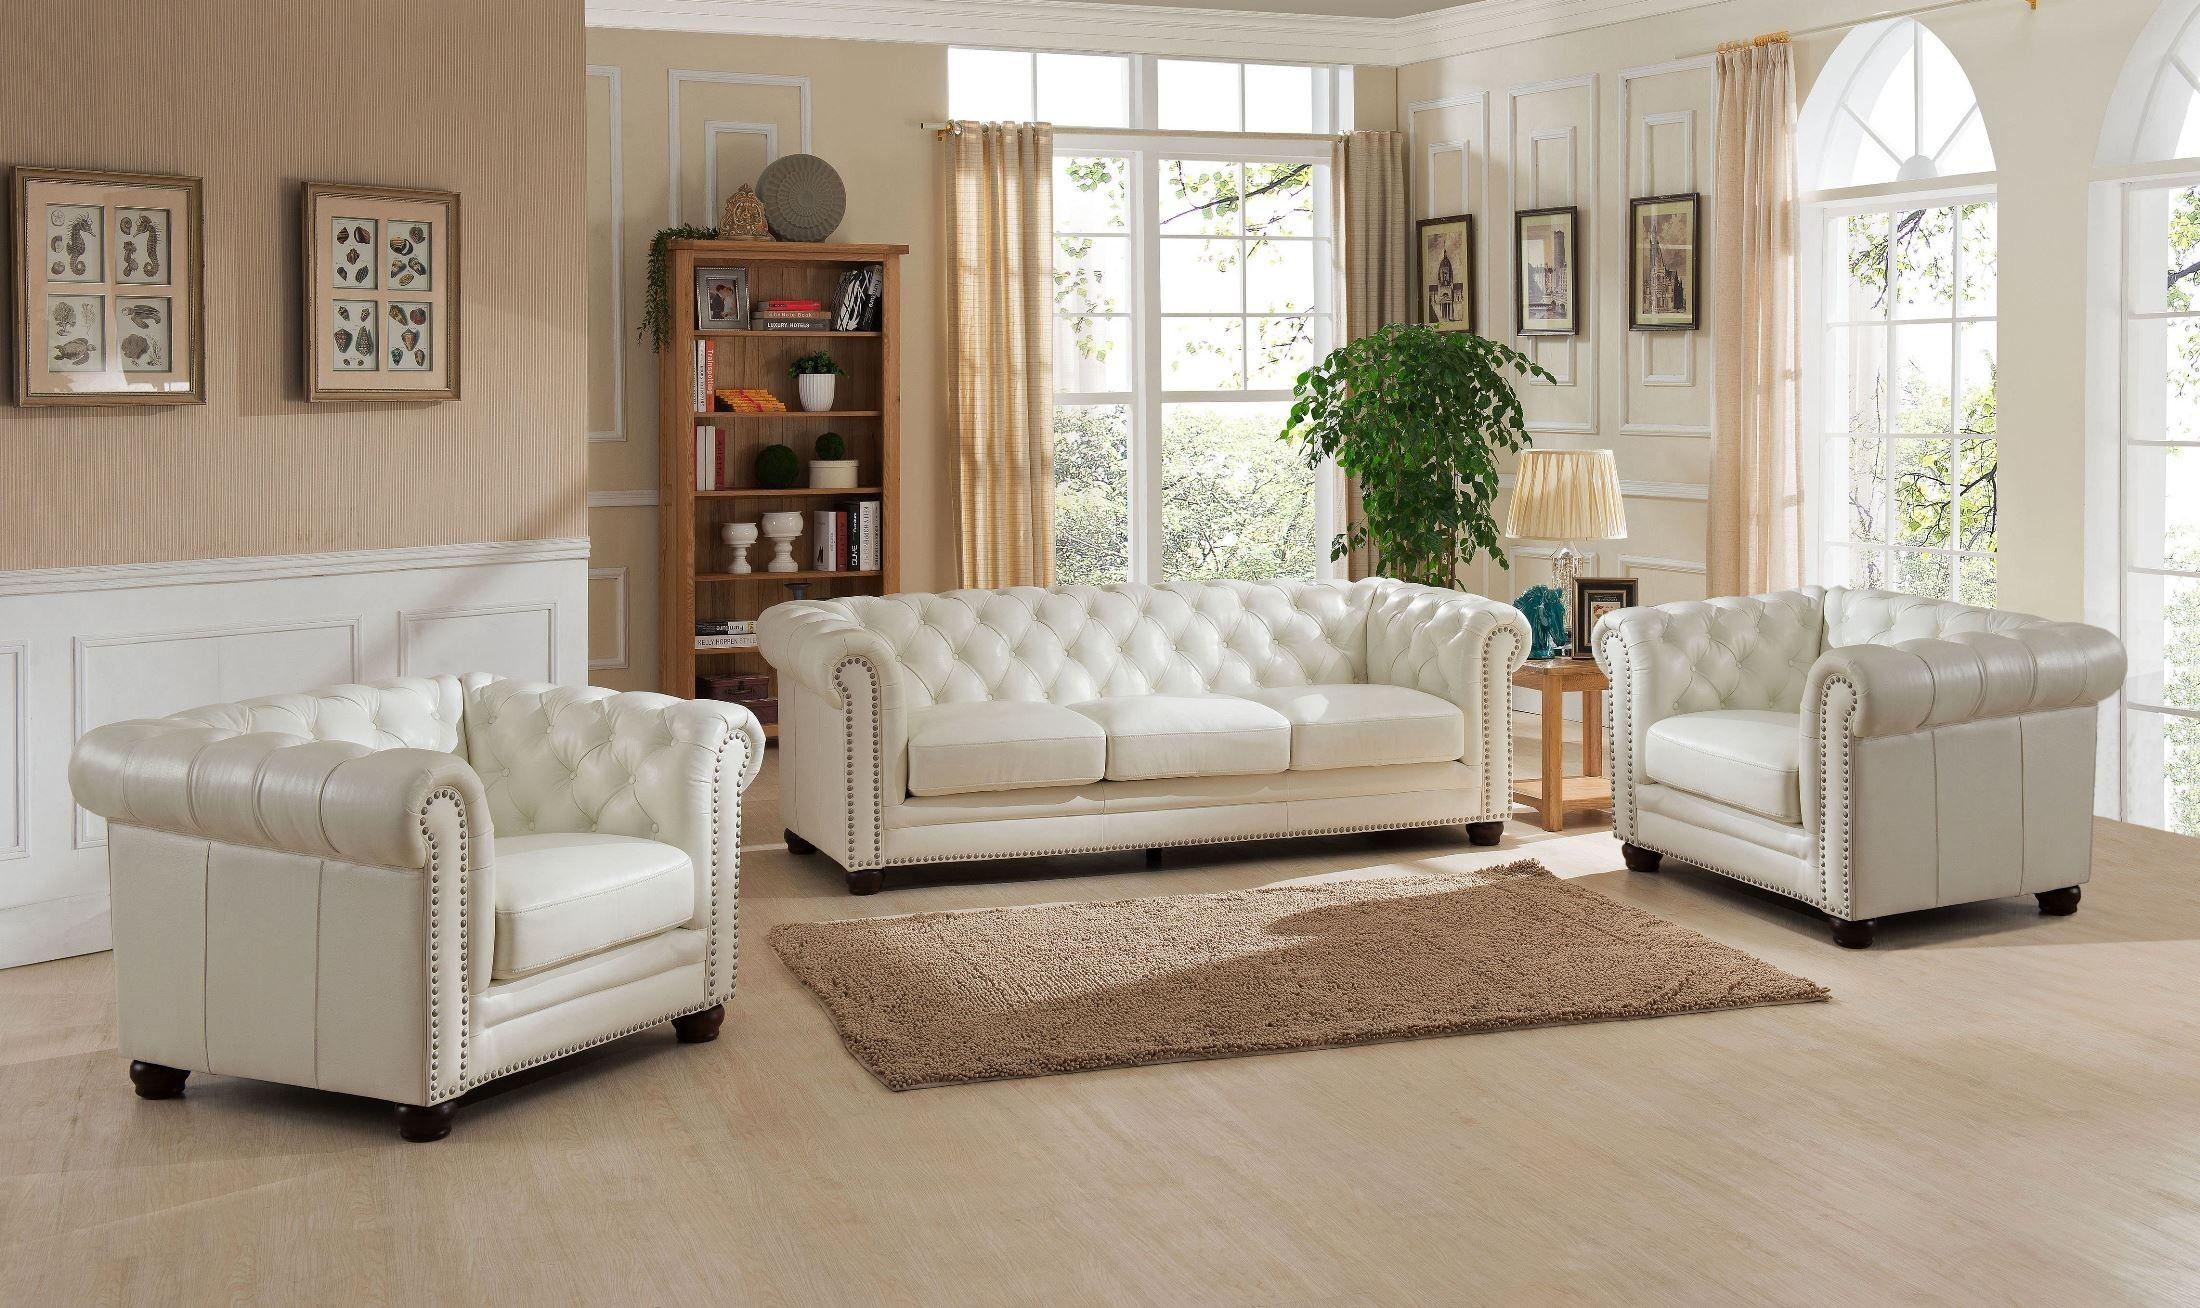 Monaco Pearl White Leather Sofa In 2021 Living Room Leather Living Room Sets Furniture White Leather Sofas White leather sofa and loveseat